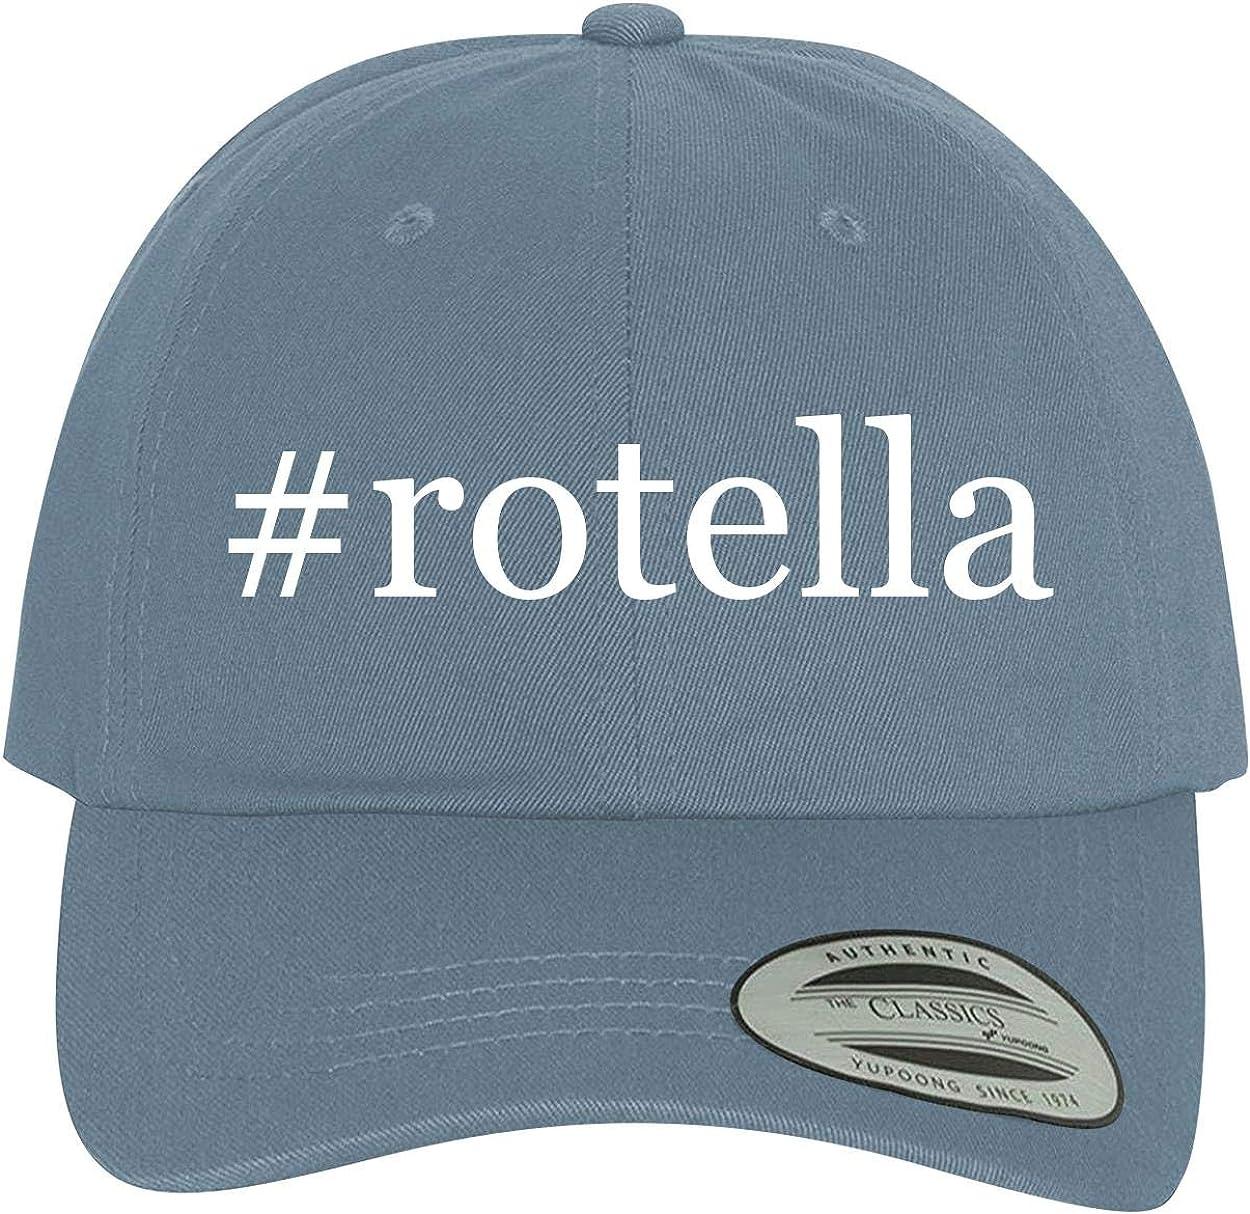 Comfortable Dad Hat Baseball Cap BH Cool Designs #Rotella